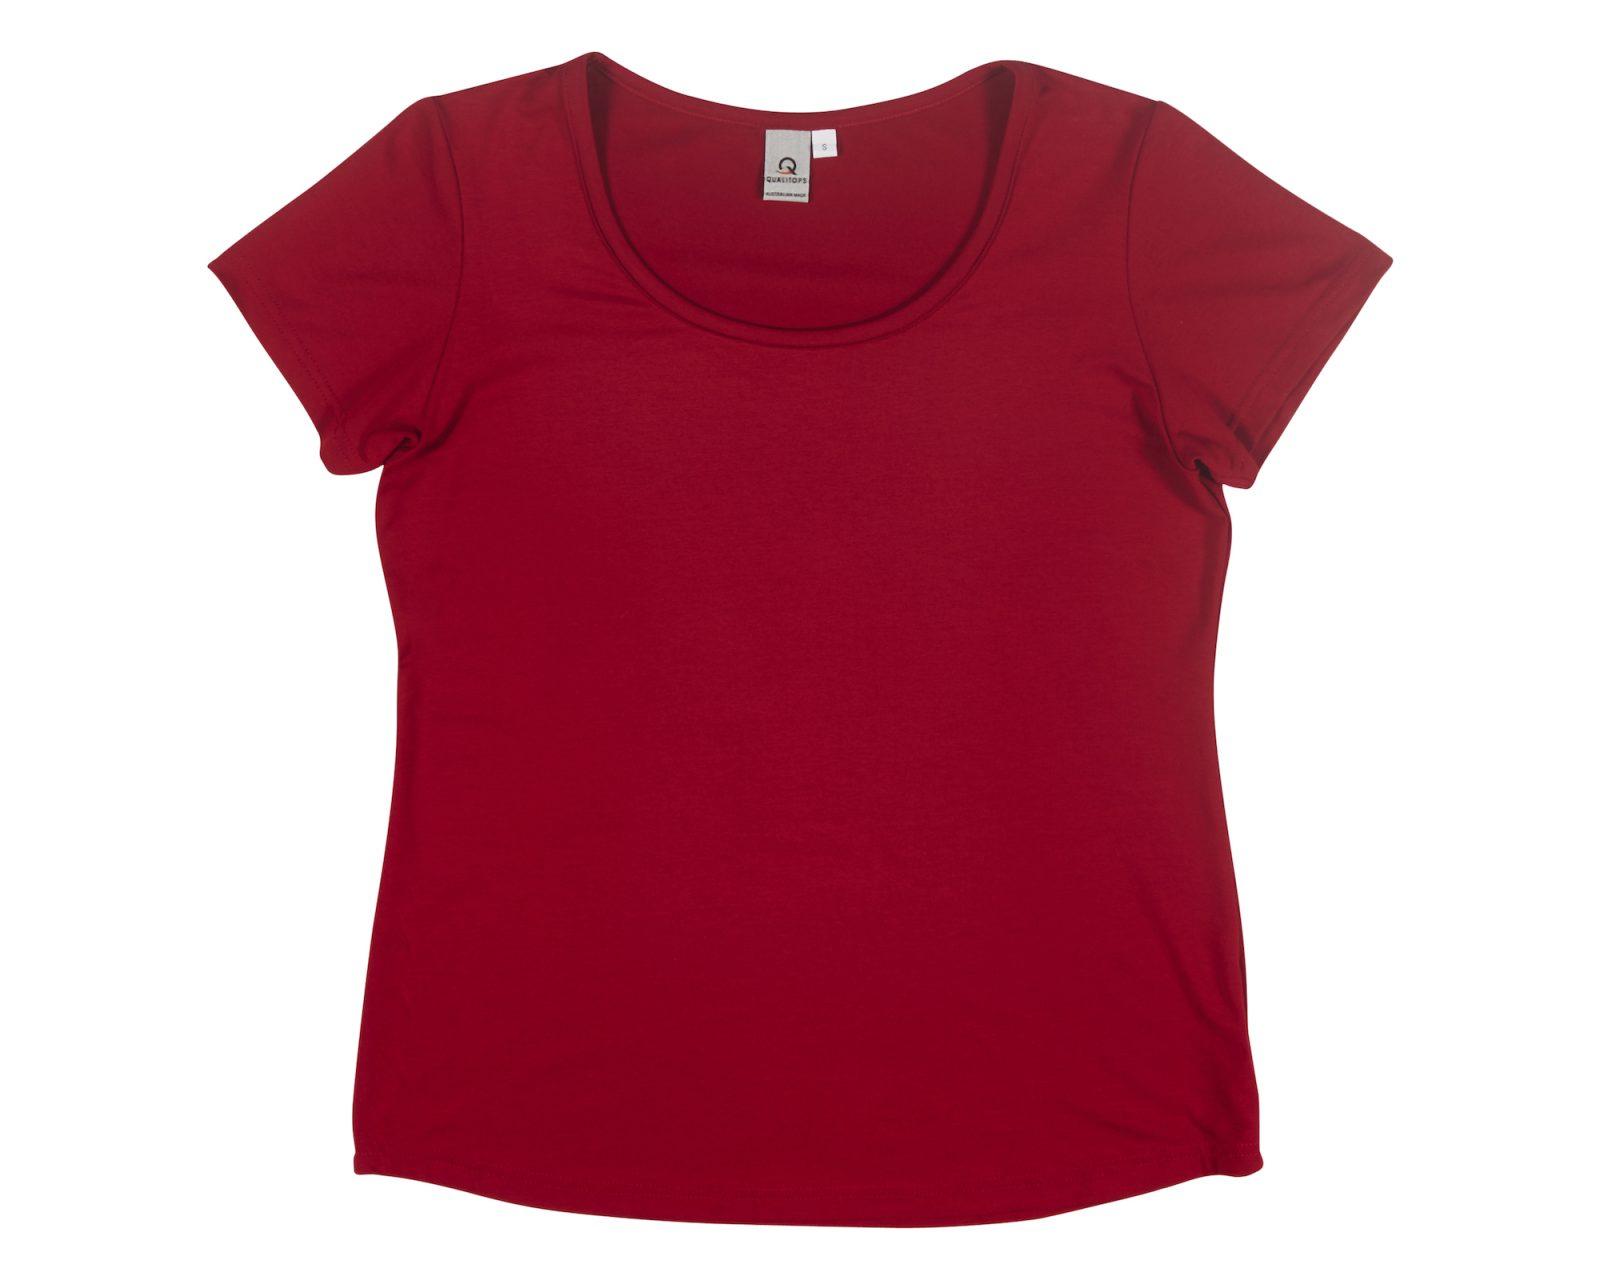 Custom Made Women 39 S Clothing T Shirts Polo Shirts